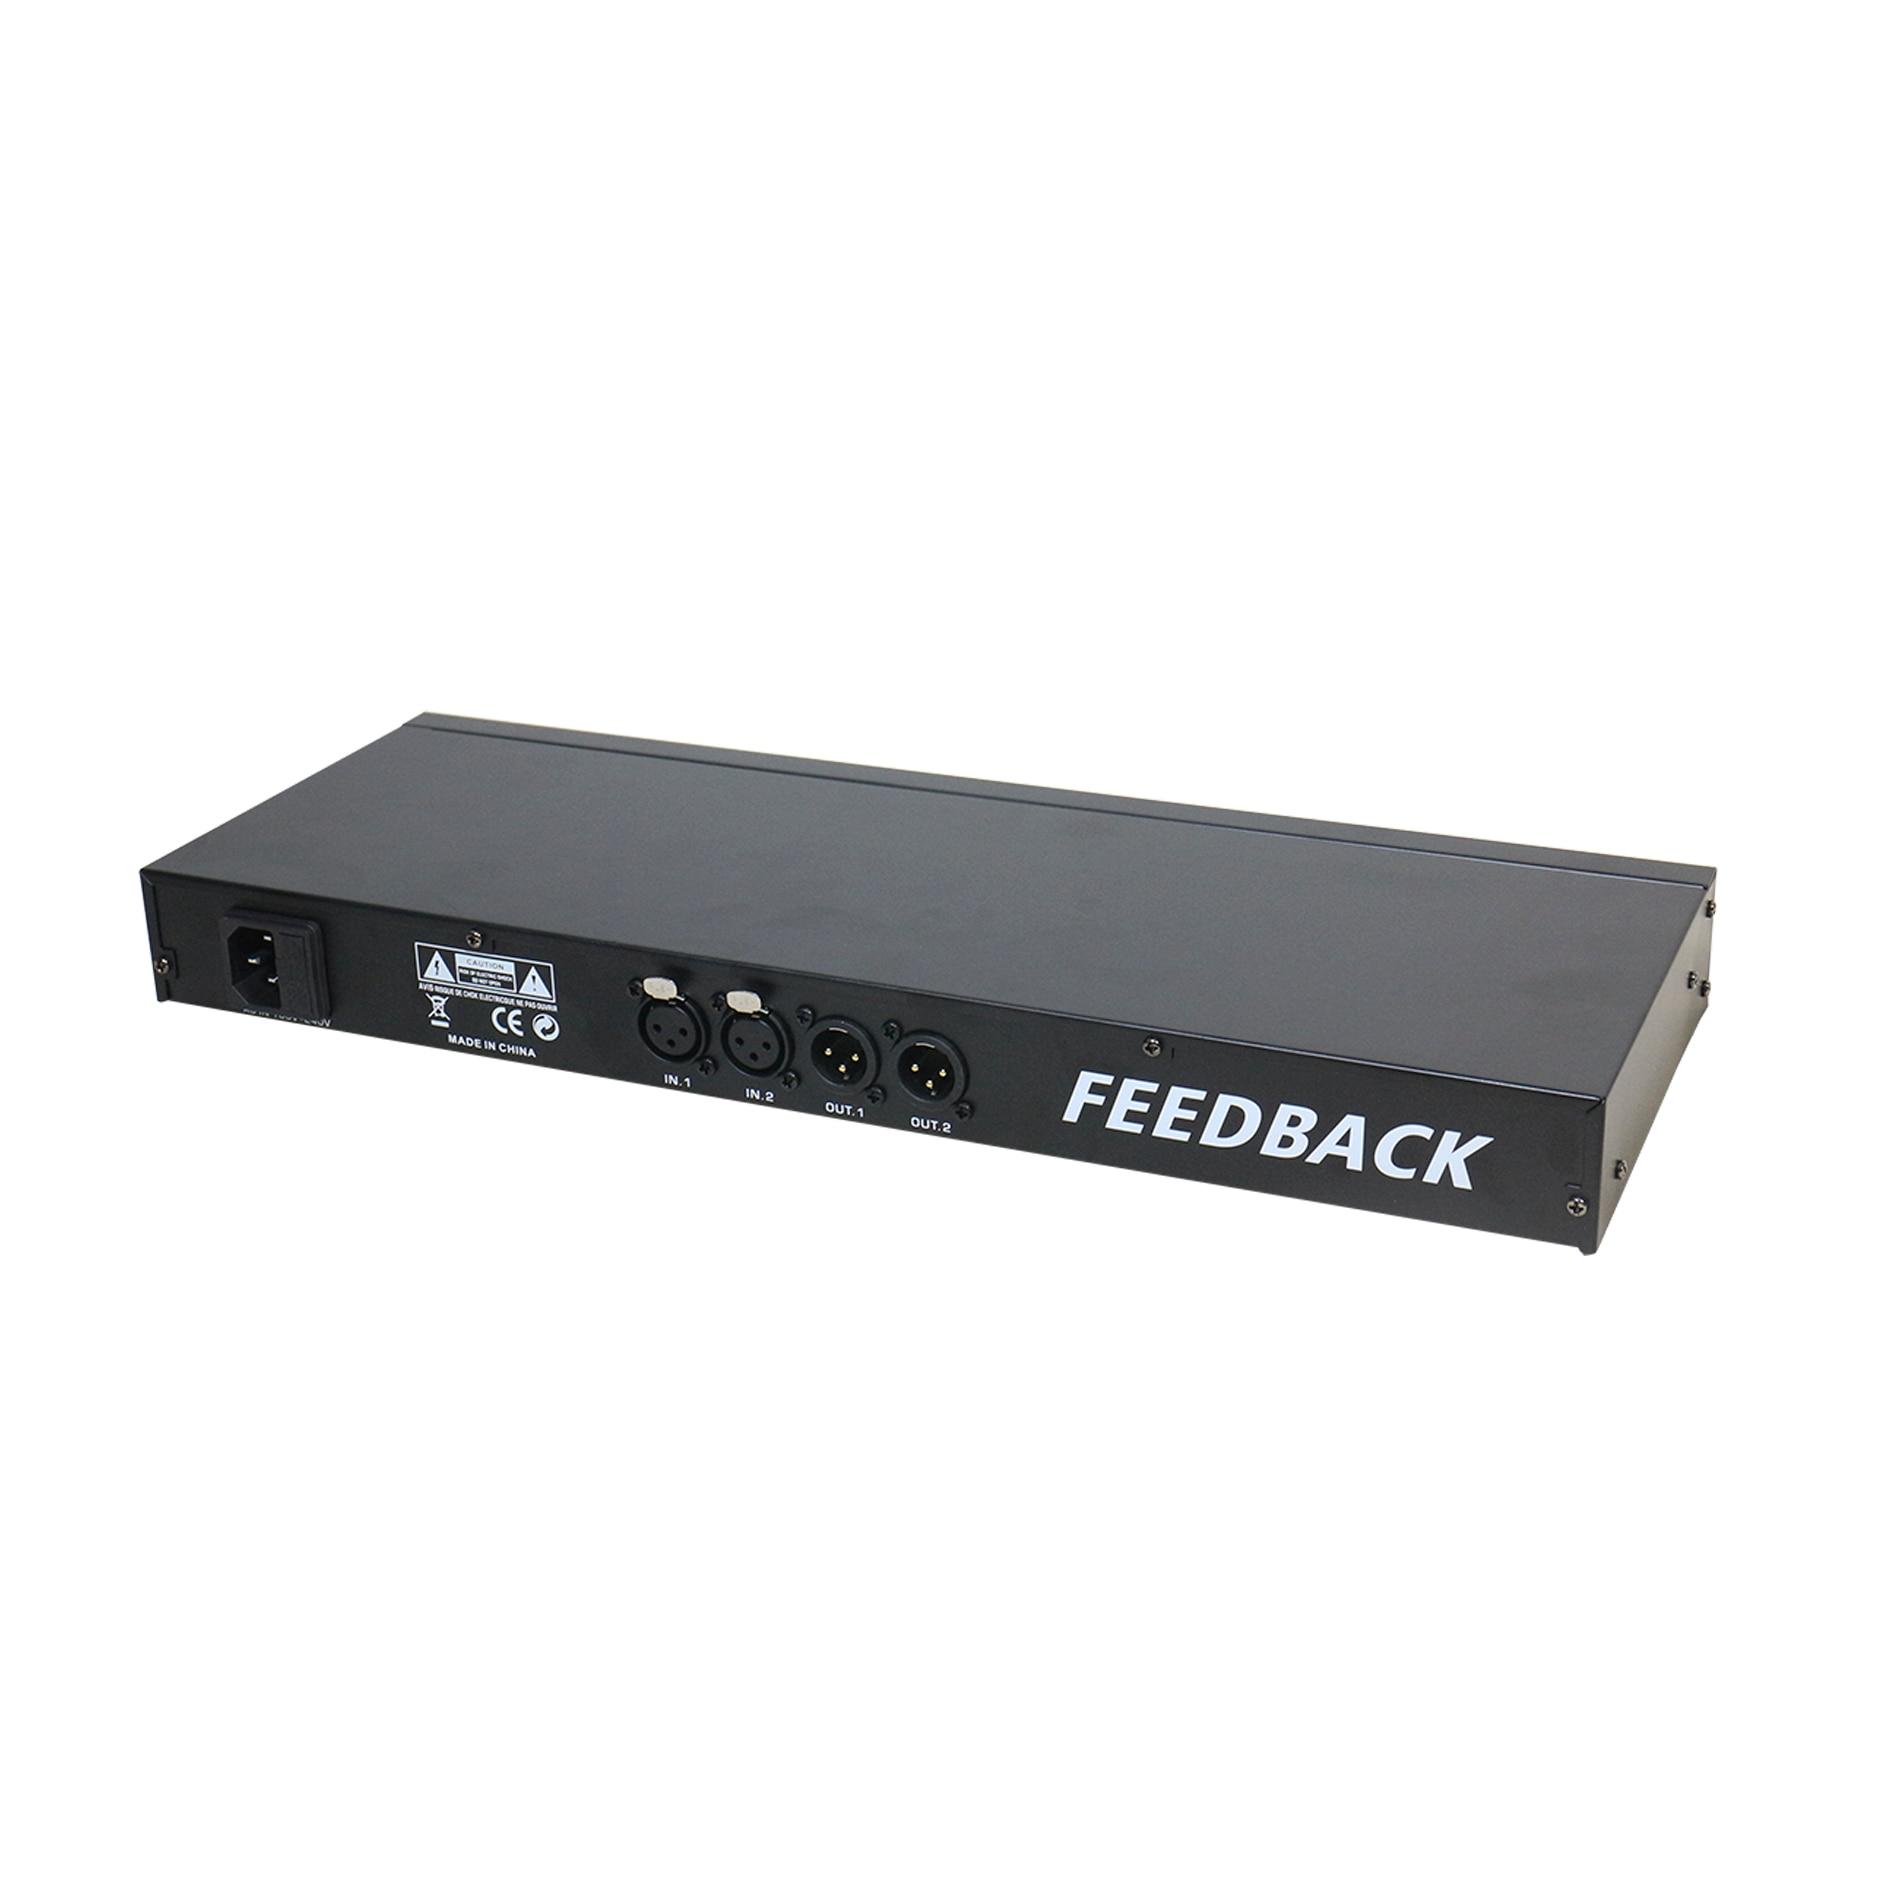 Microphone Anti-howling Digital Feedback Suppressor Karaoke Reverb Professional stage audio Feedback Audio Mixing Processor